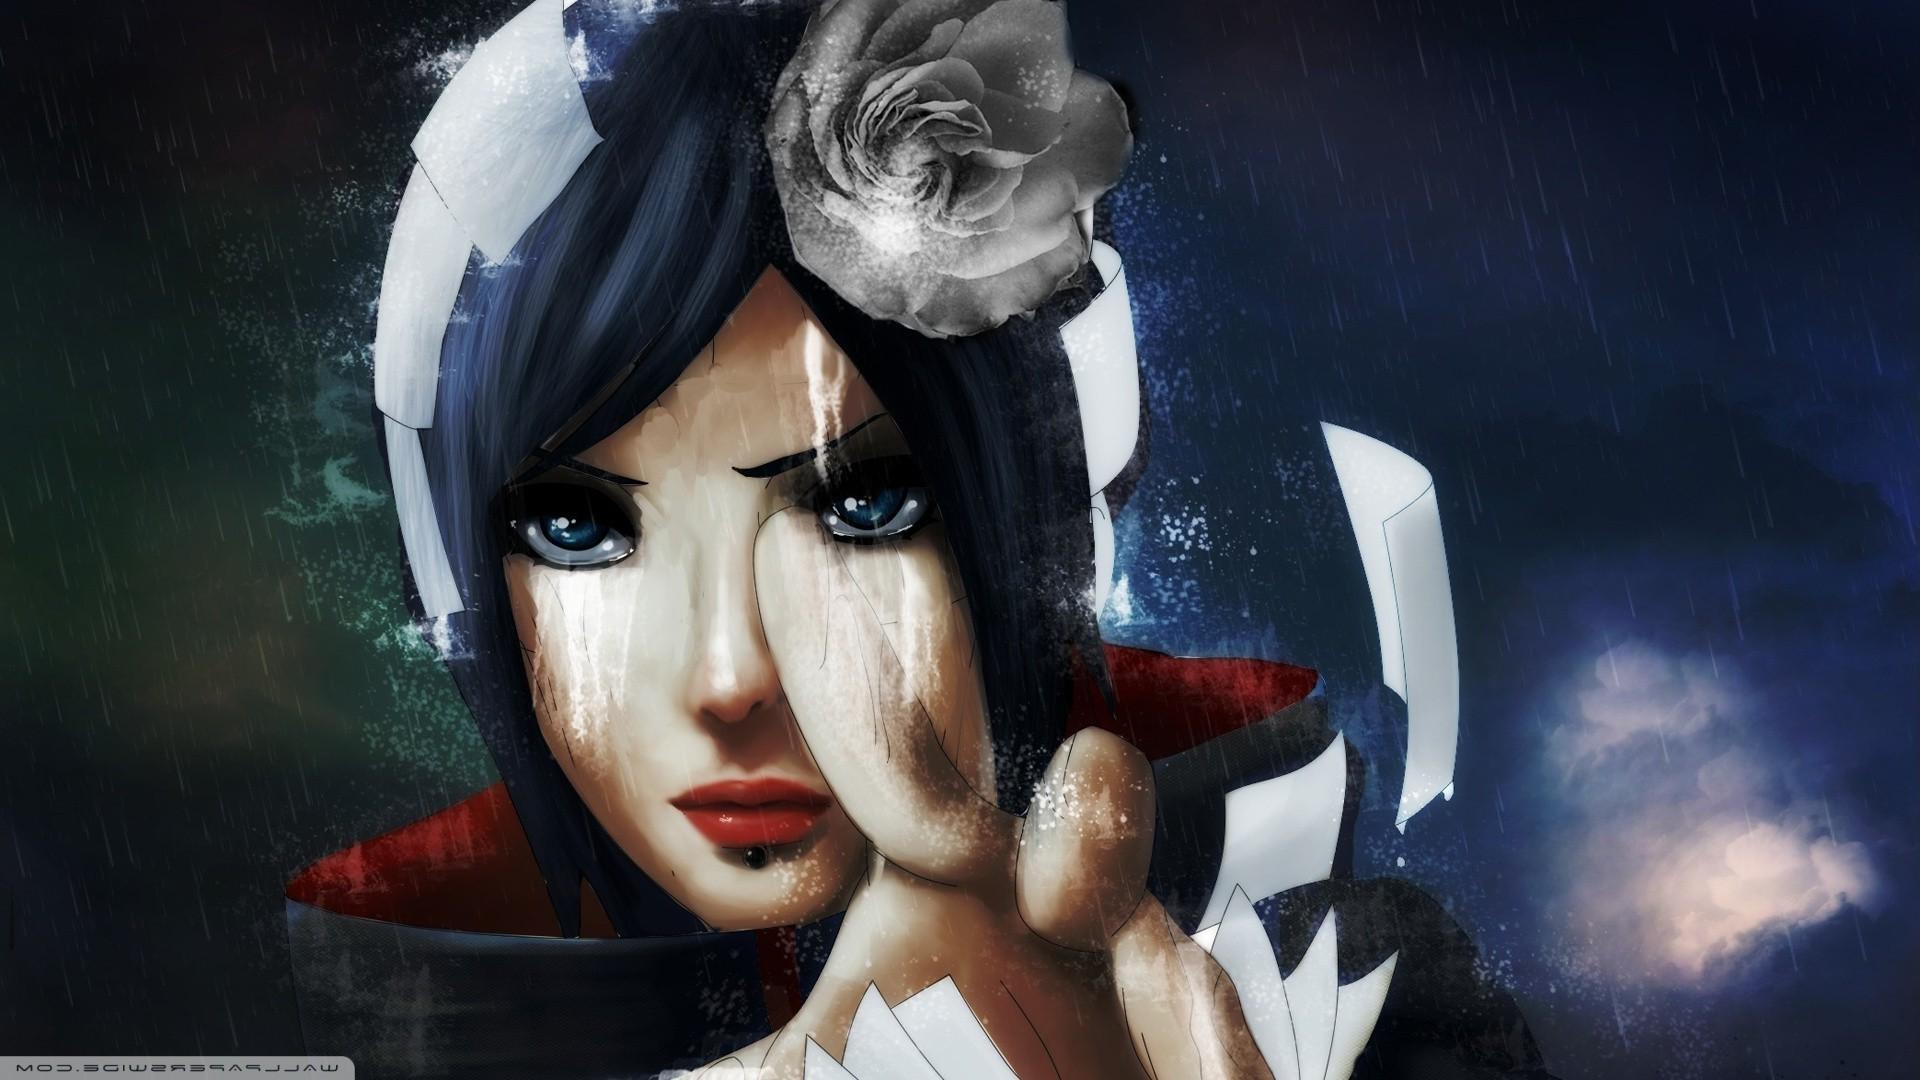 Res: 1920x1080, Konan, Naruto Shippuuden, Akatsuki, Flower In Hair, Blue Hair